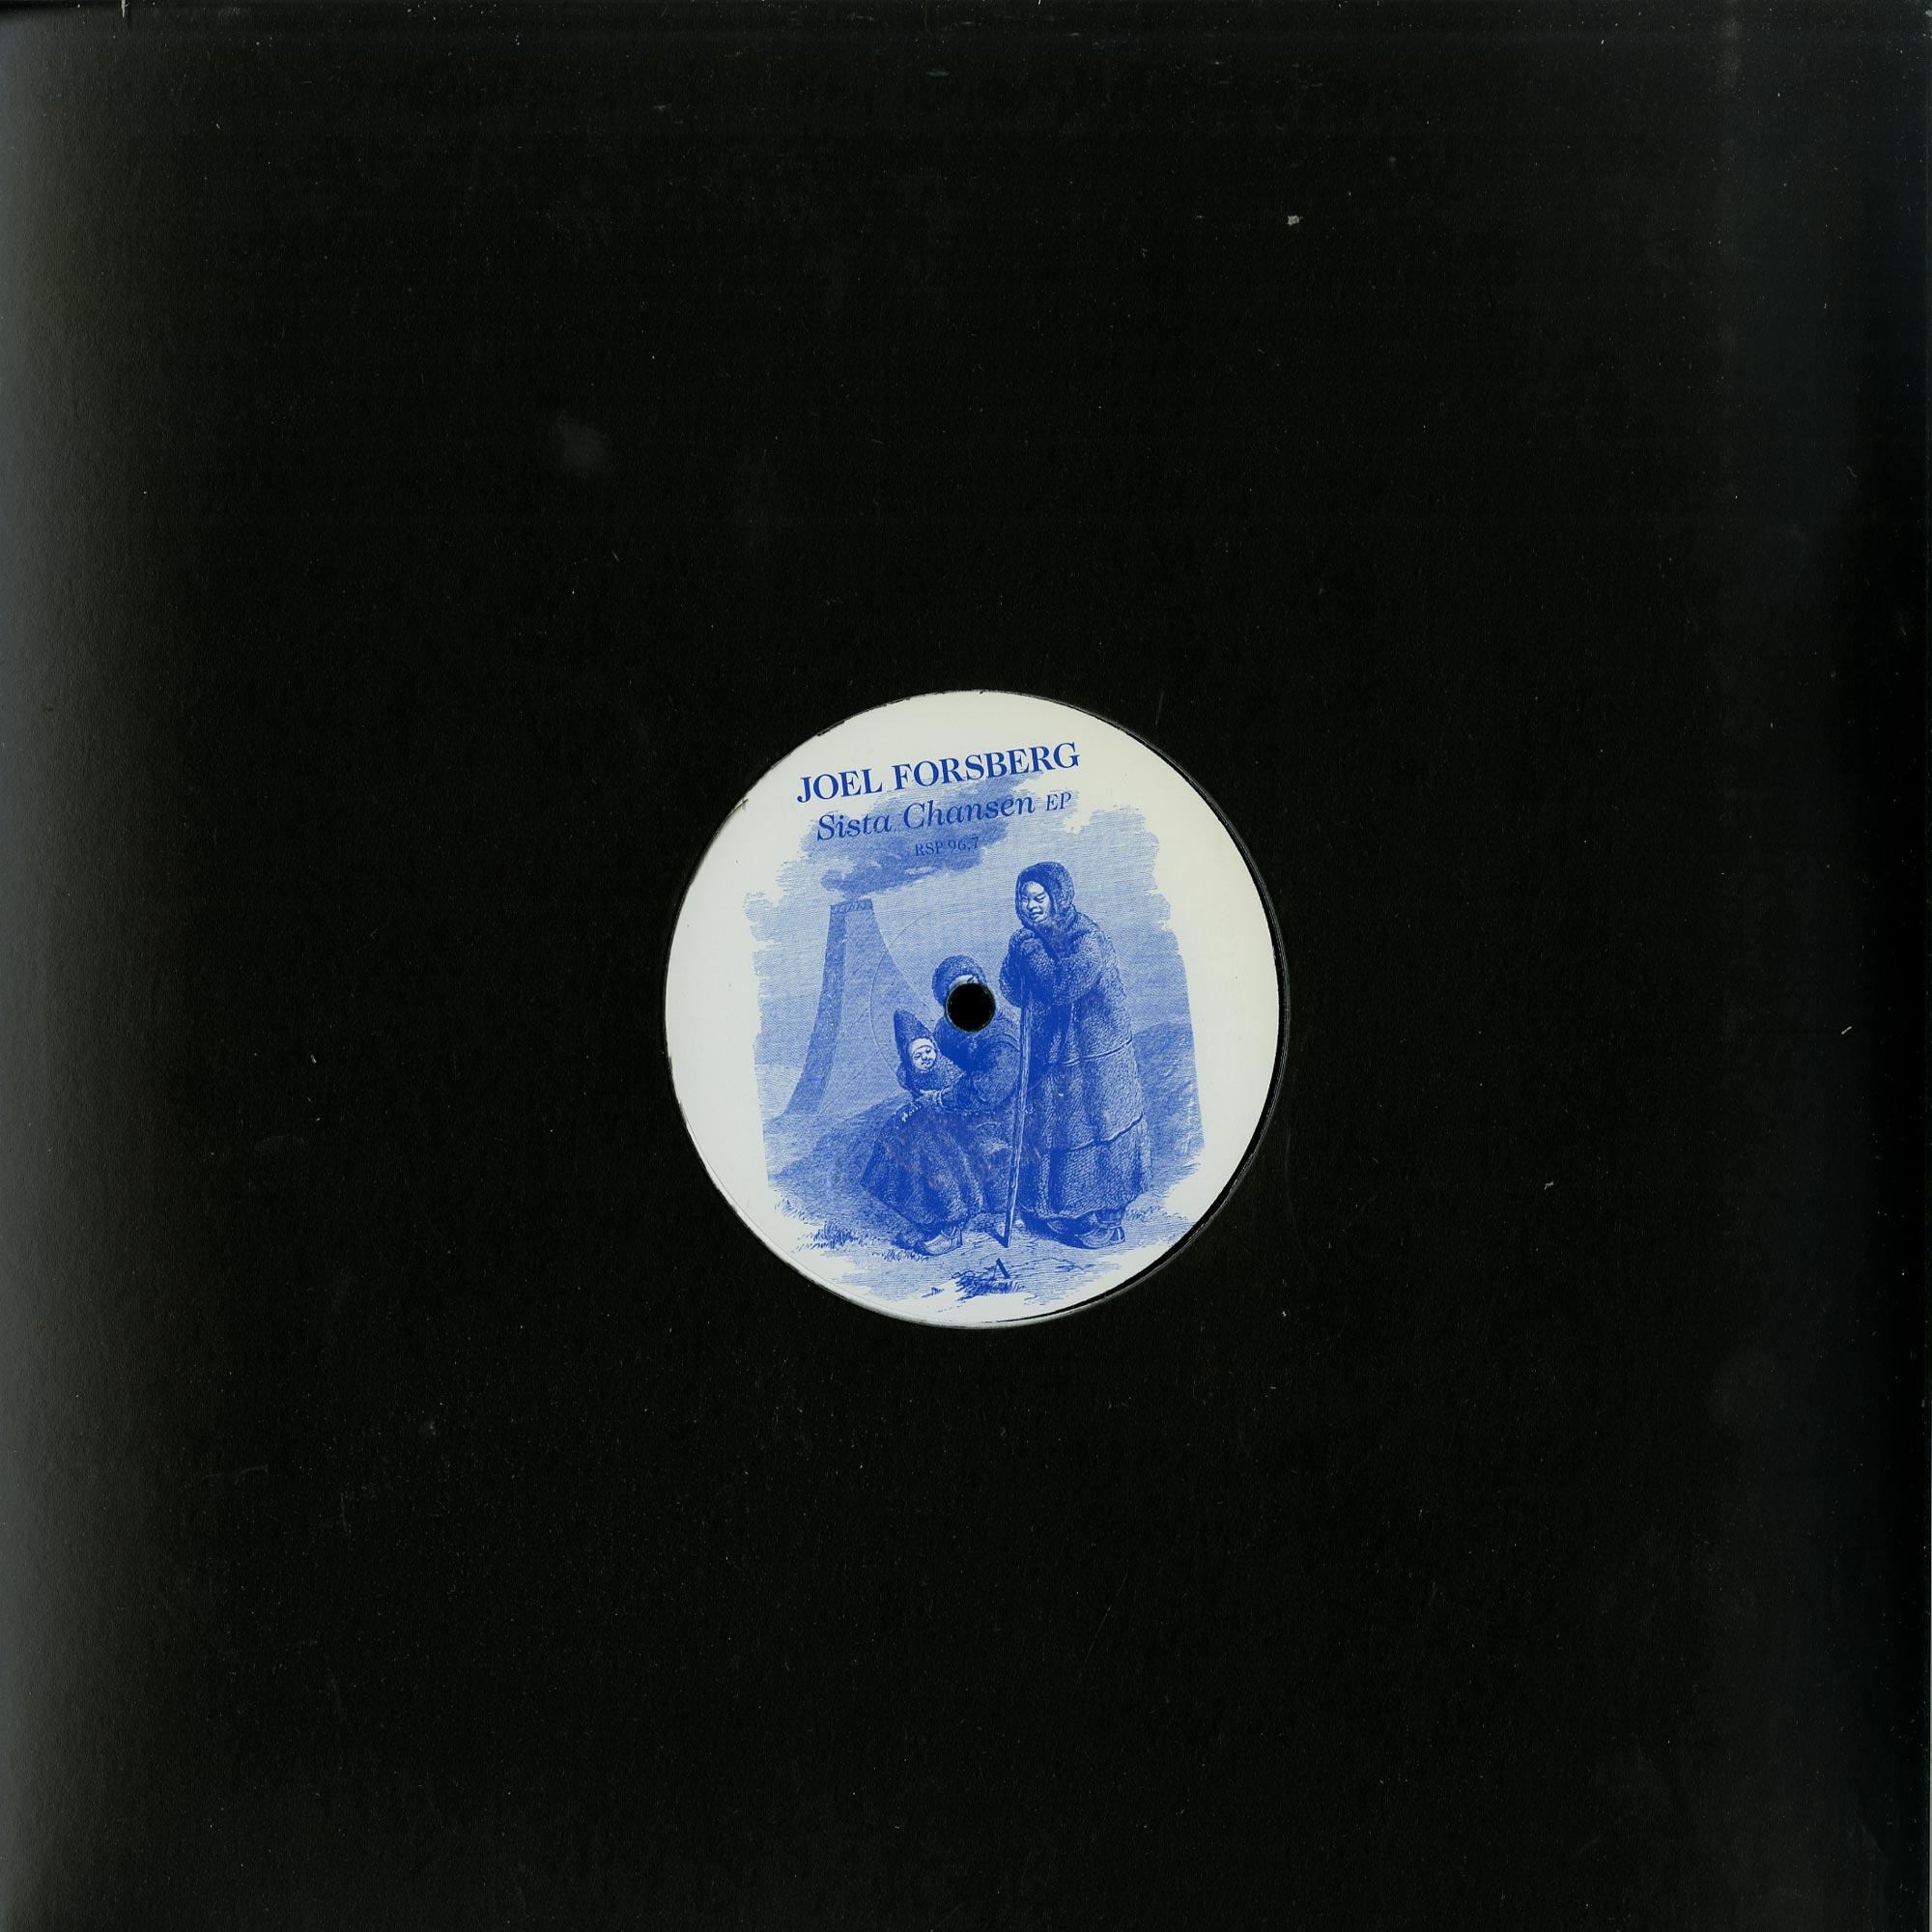 Joel Forsberg - SISTA CHANSEN EP